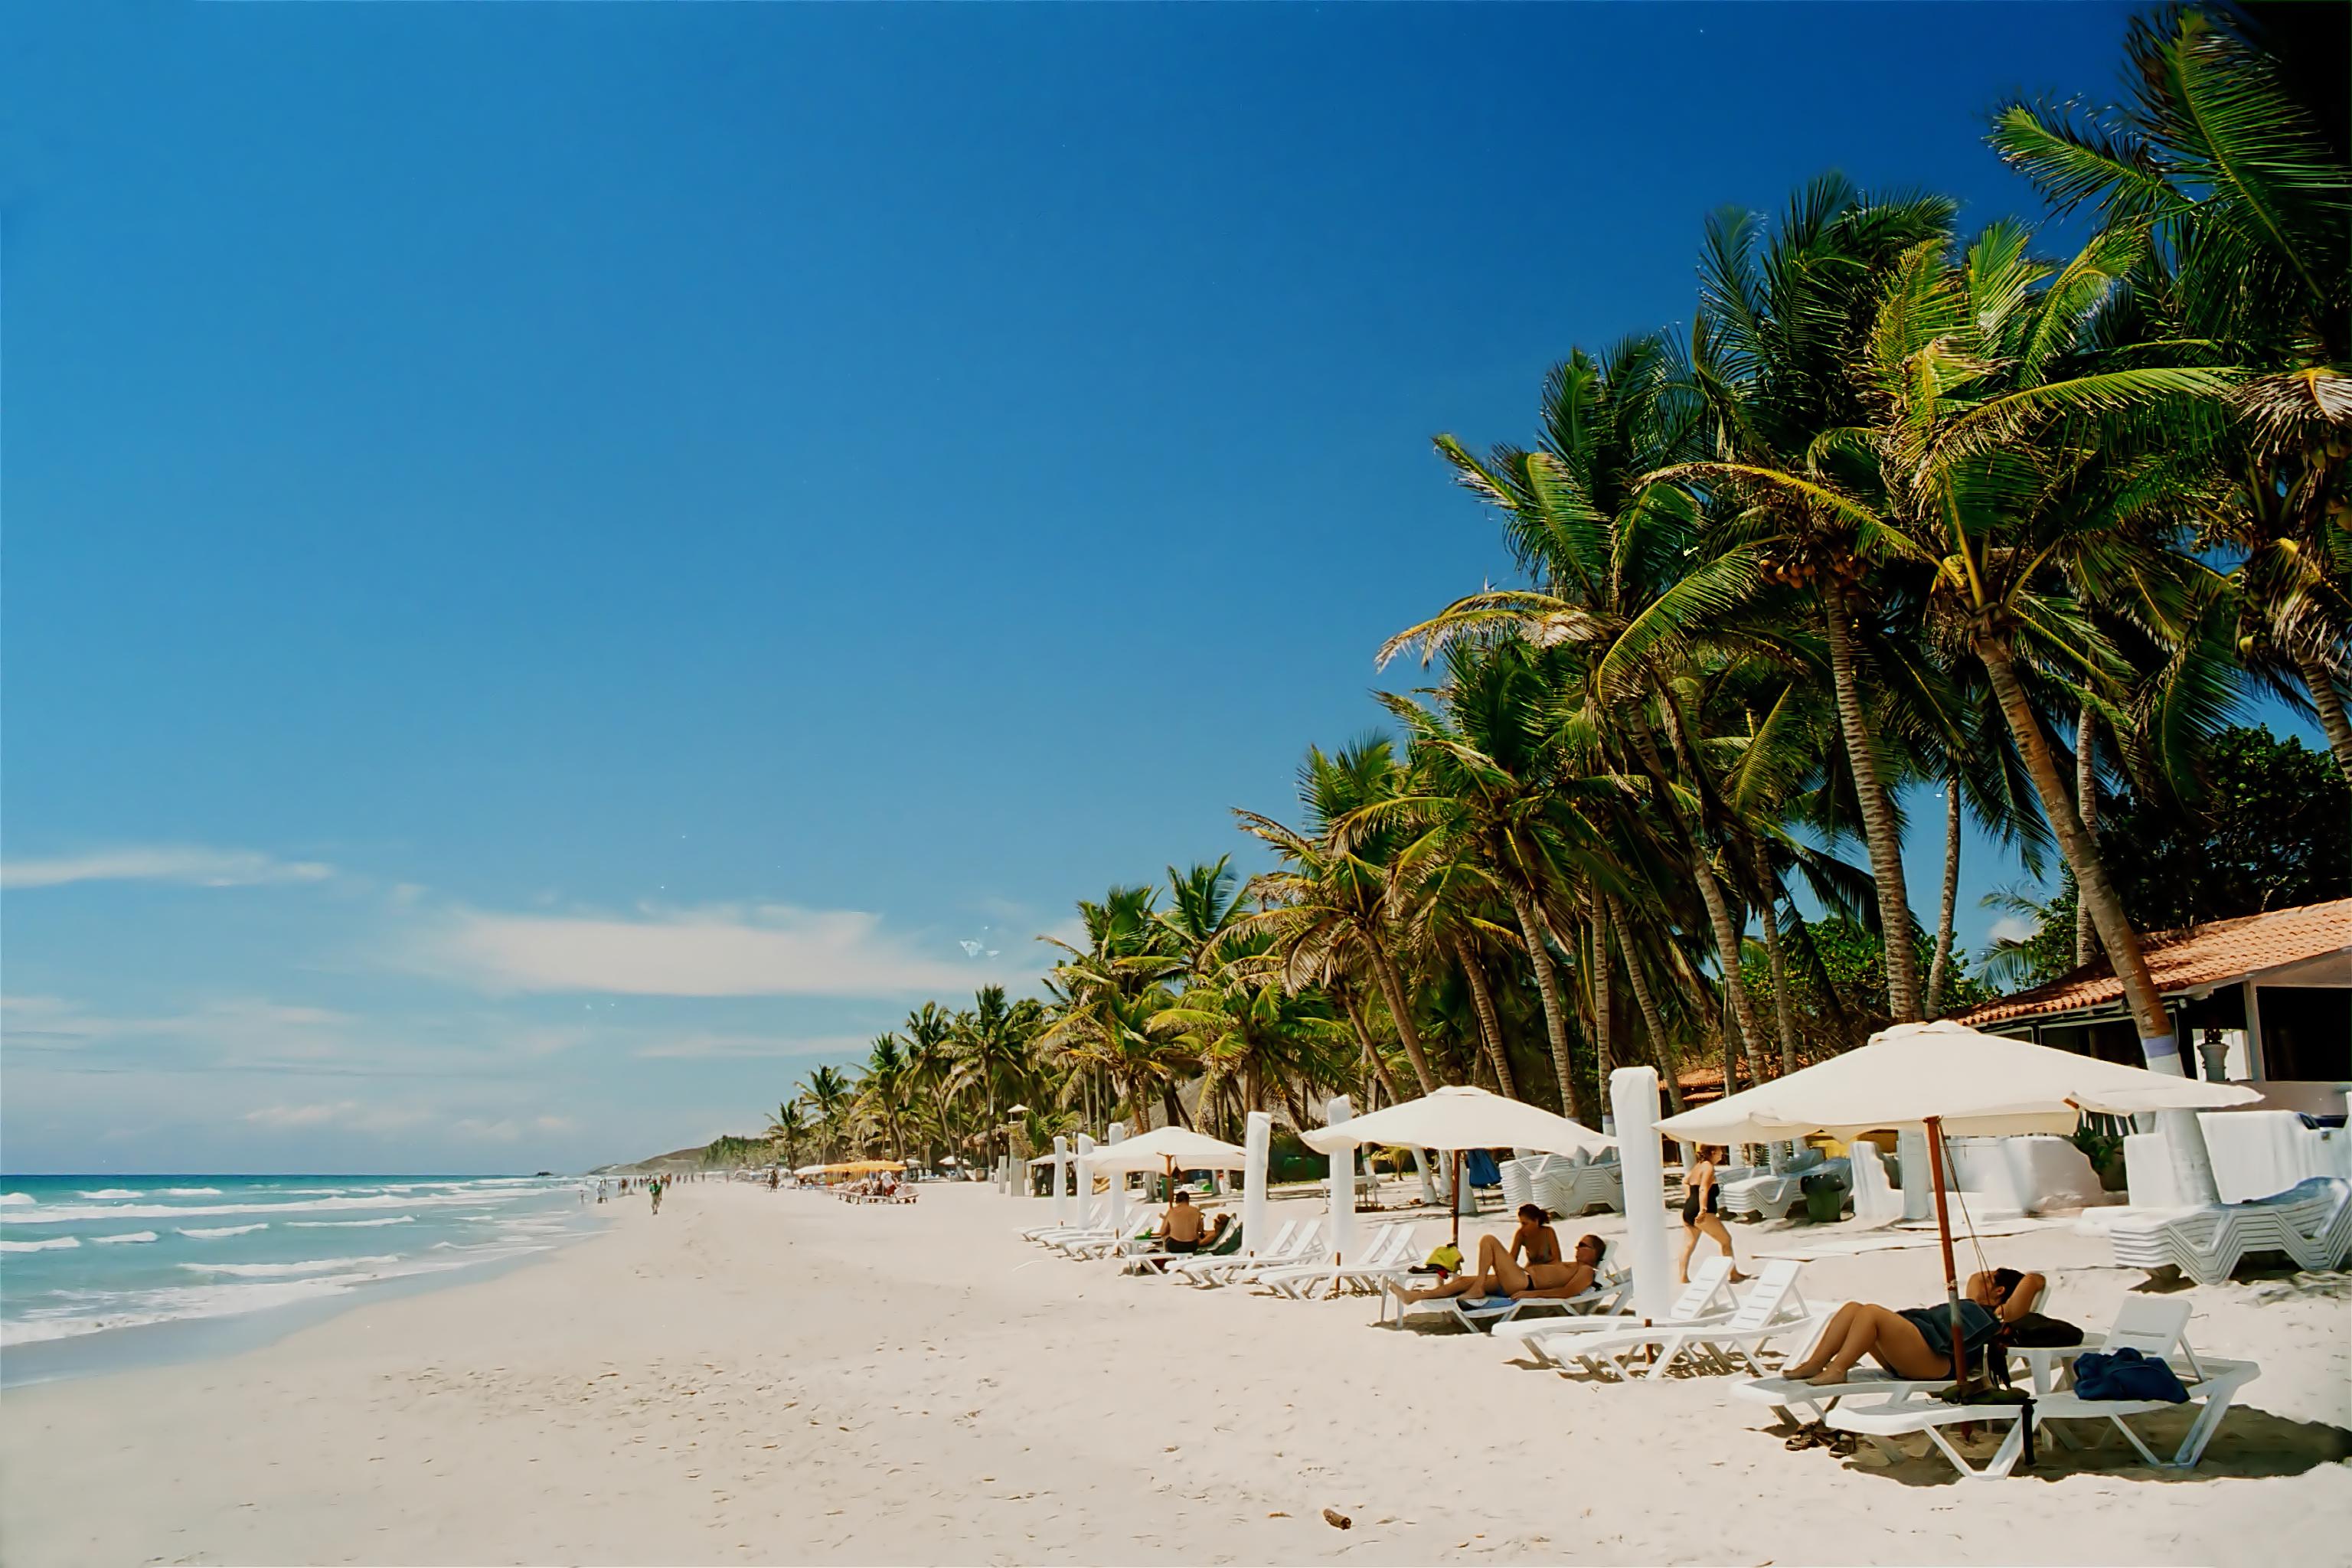 El Caribe Hotel Daytona Beach Florida